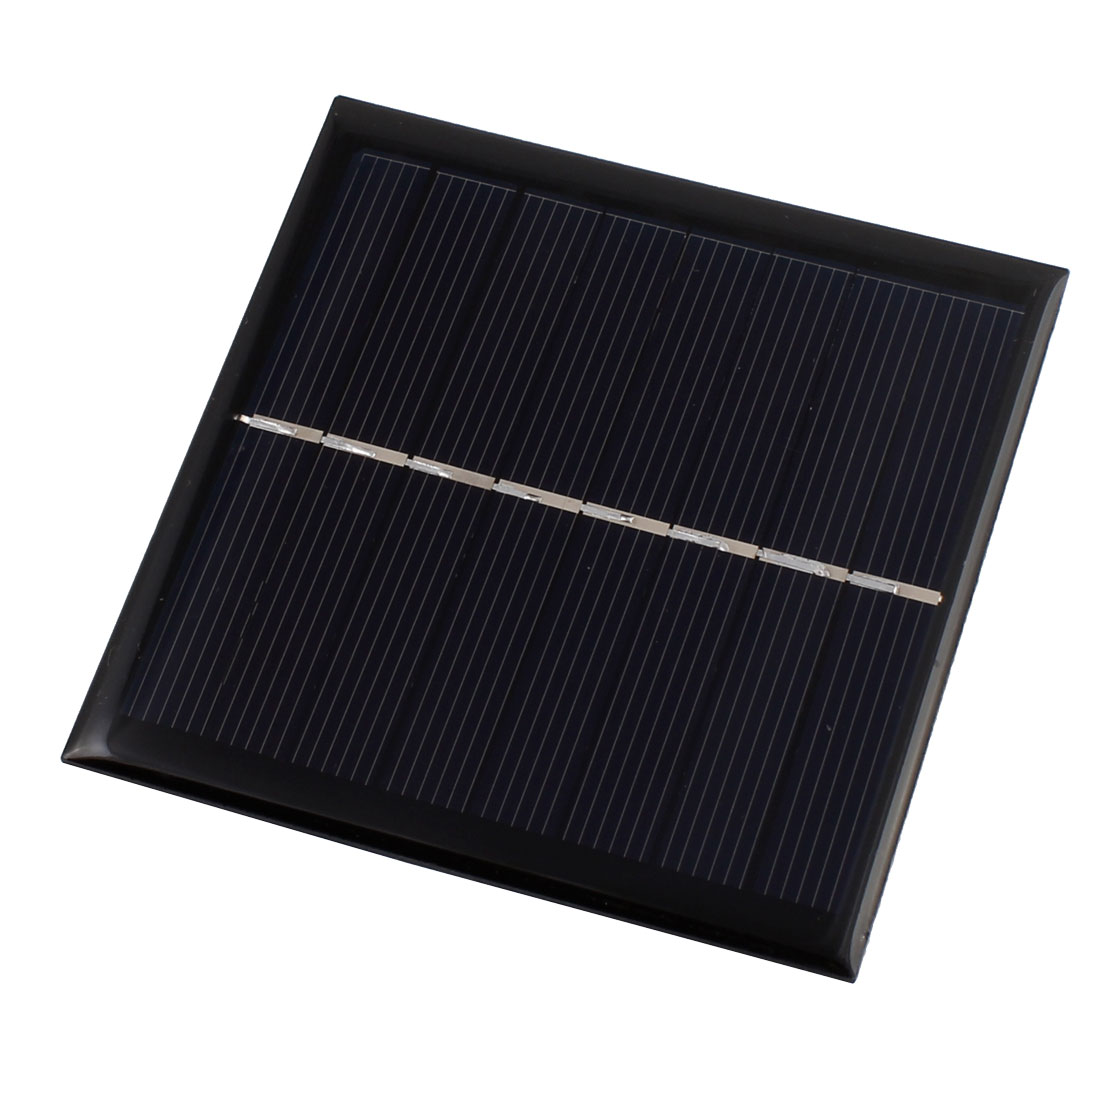 90mmx90mm 1 Watt 4 Volts Polycrystalline Solar Panel for 1.5V 2xAAA Battery - image 2 of 2